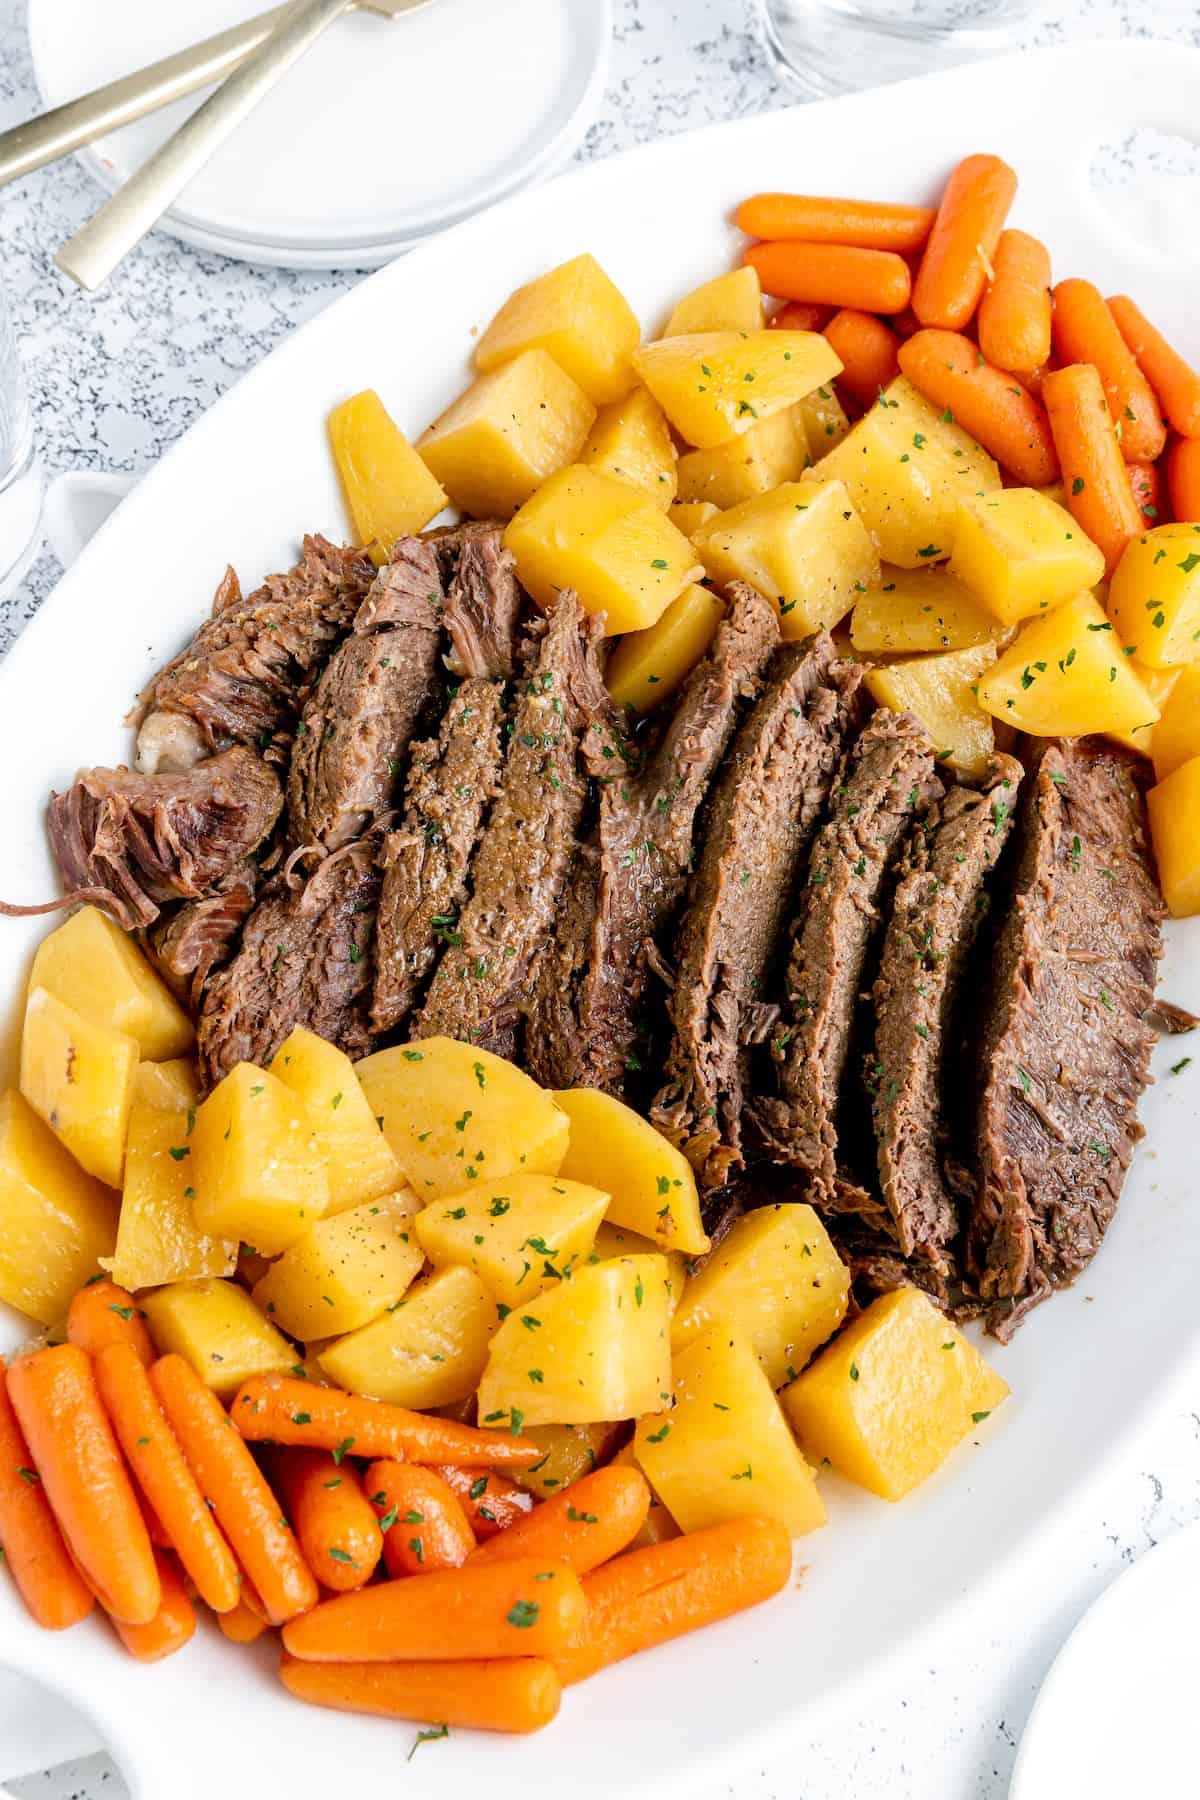 Pot roast, potatoes and carrots on a plate